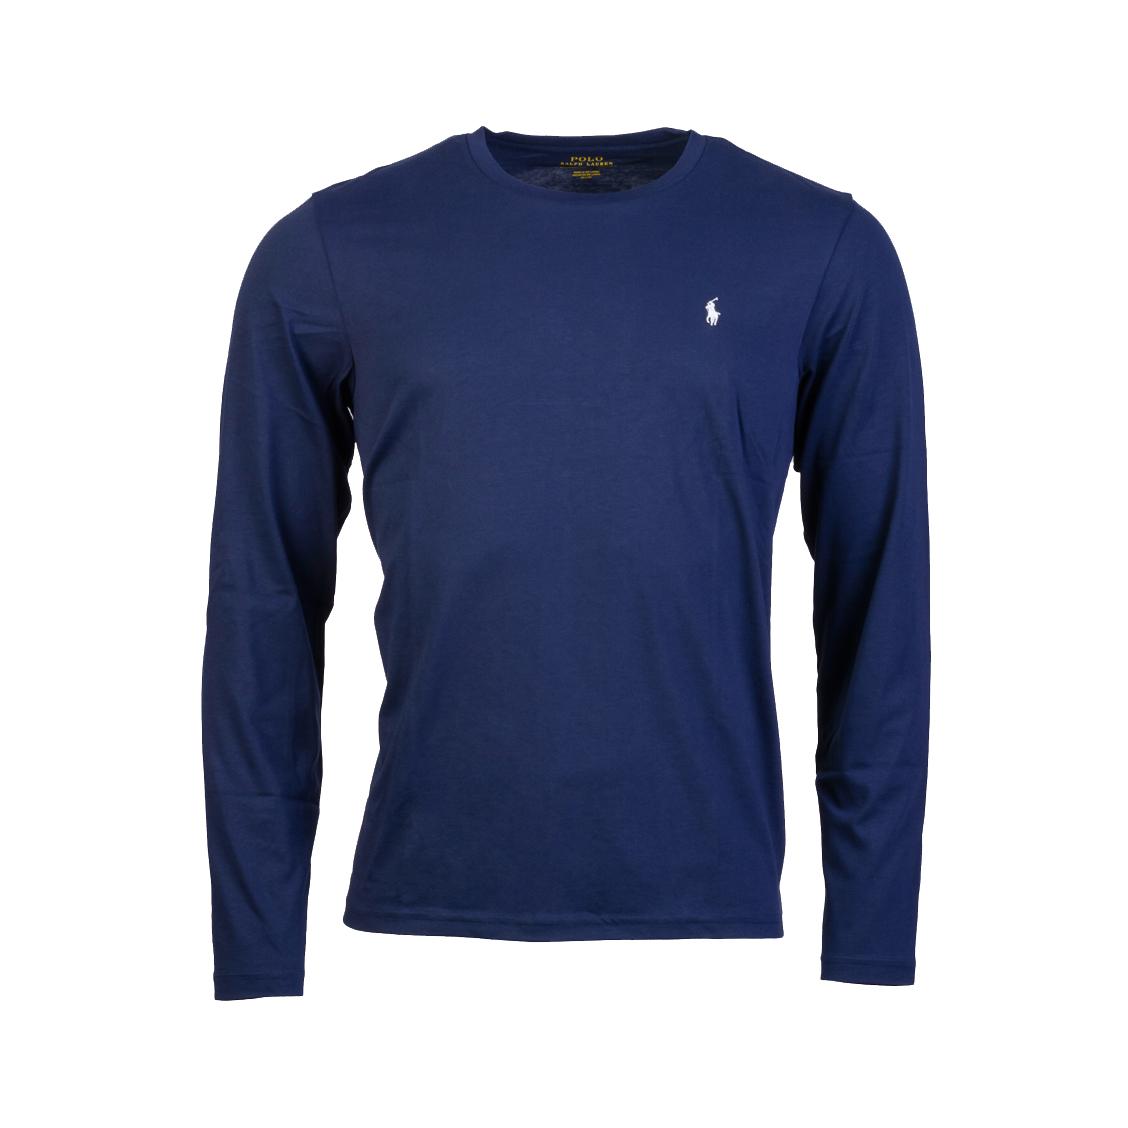 Tee-shirt manches longues col rond  en coton bleu marine brodé